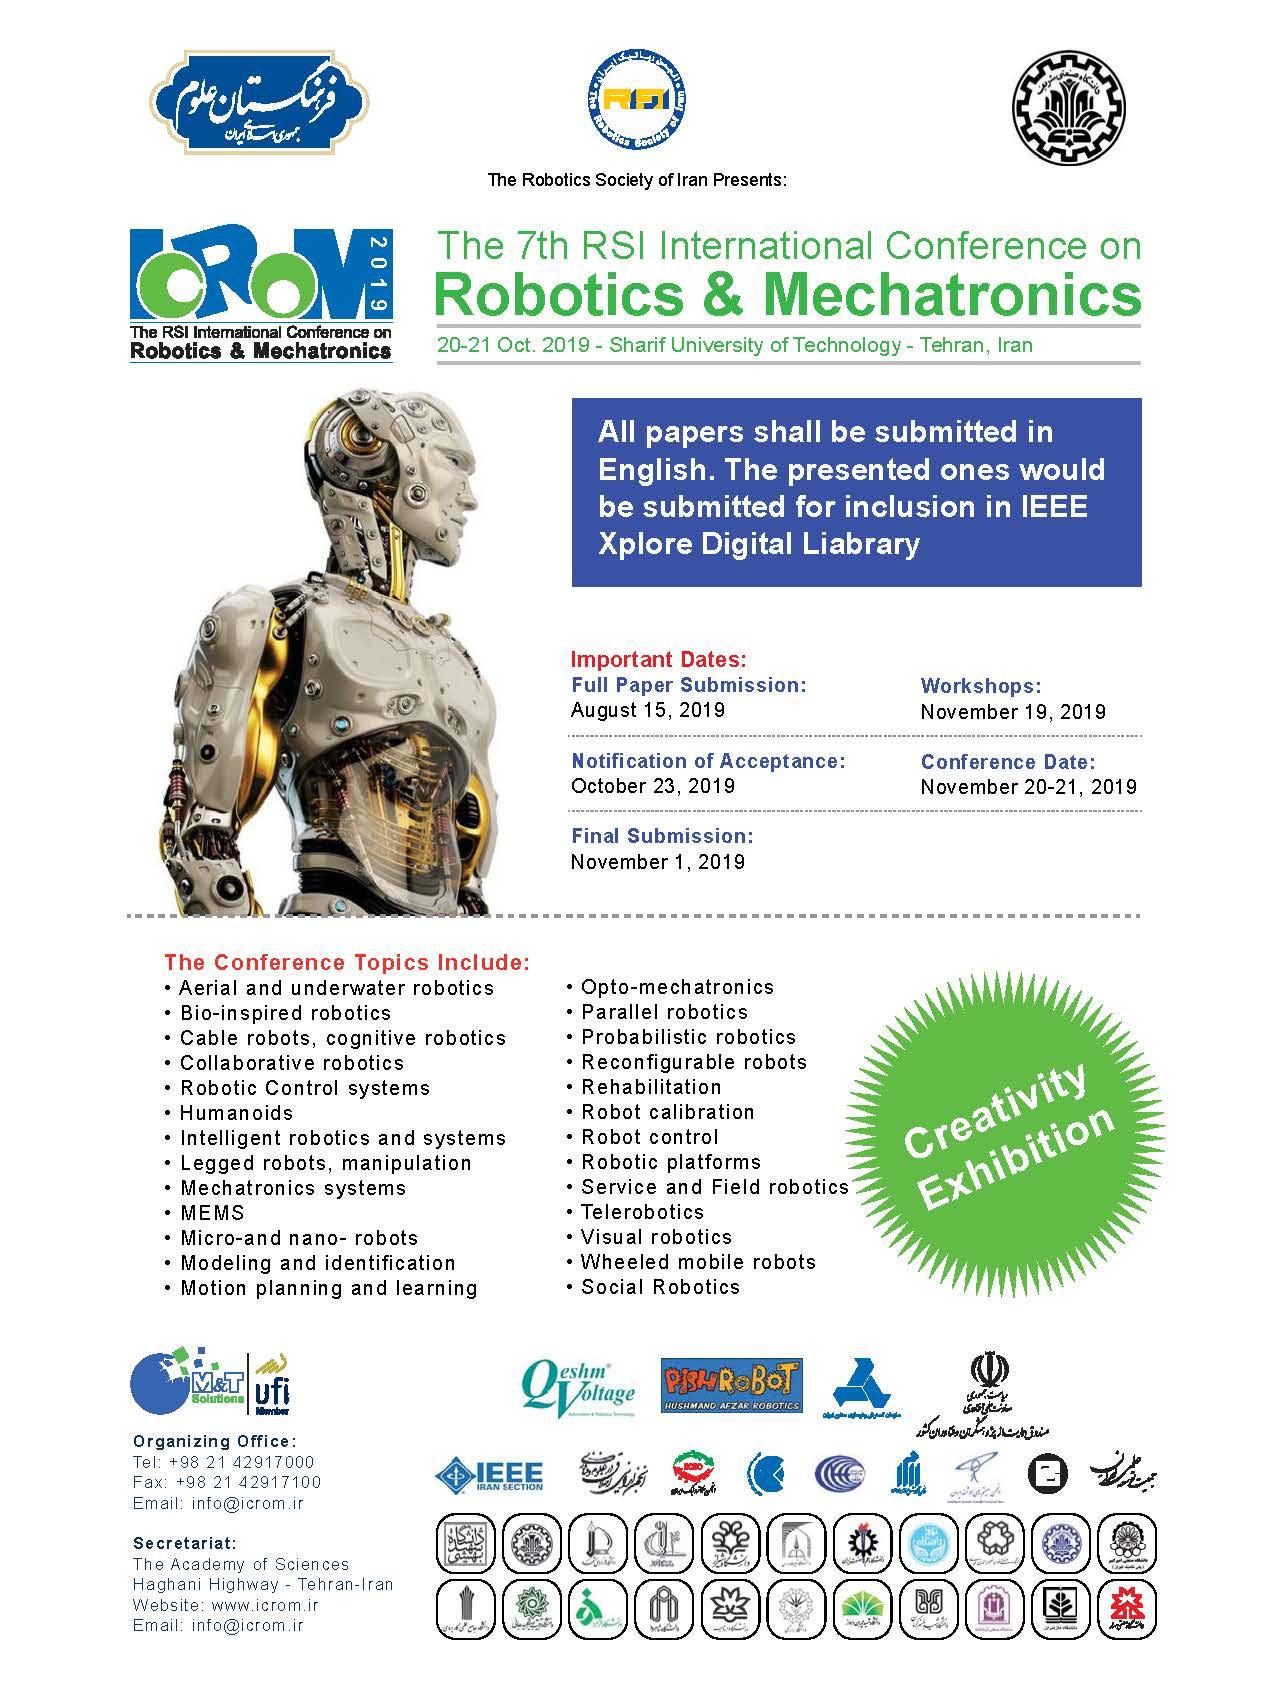 هفتمین کنفرانس بینالمللی رباتیک و مکاترونیک